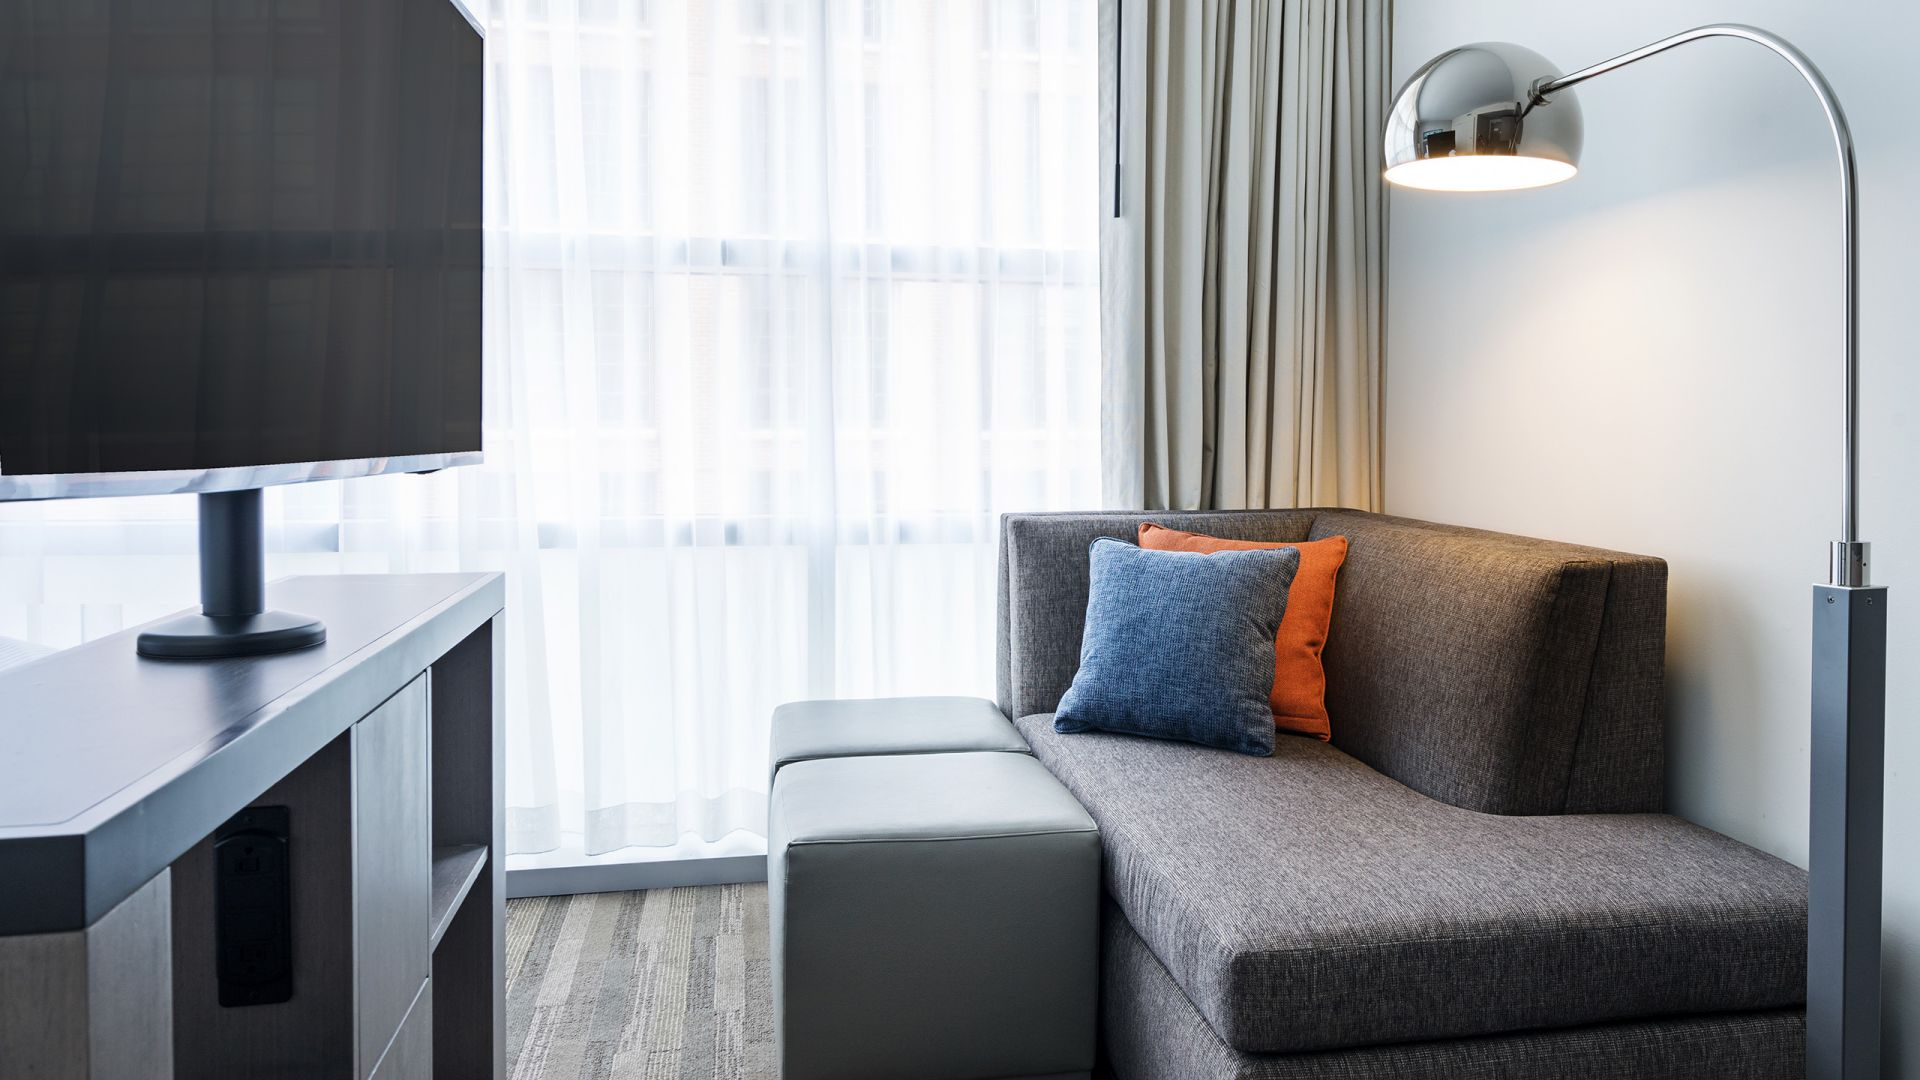 Hyatt House Washington DC, guestroom sofa and tv